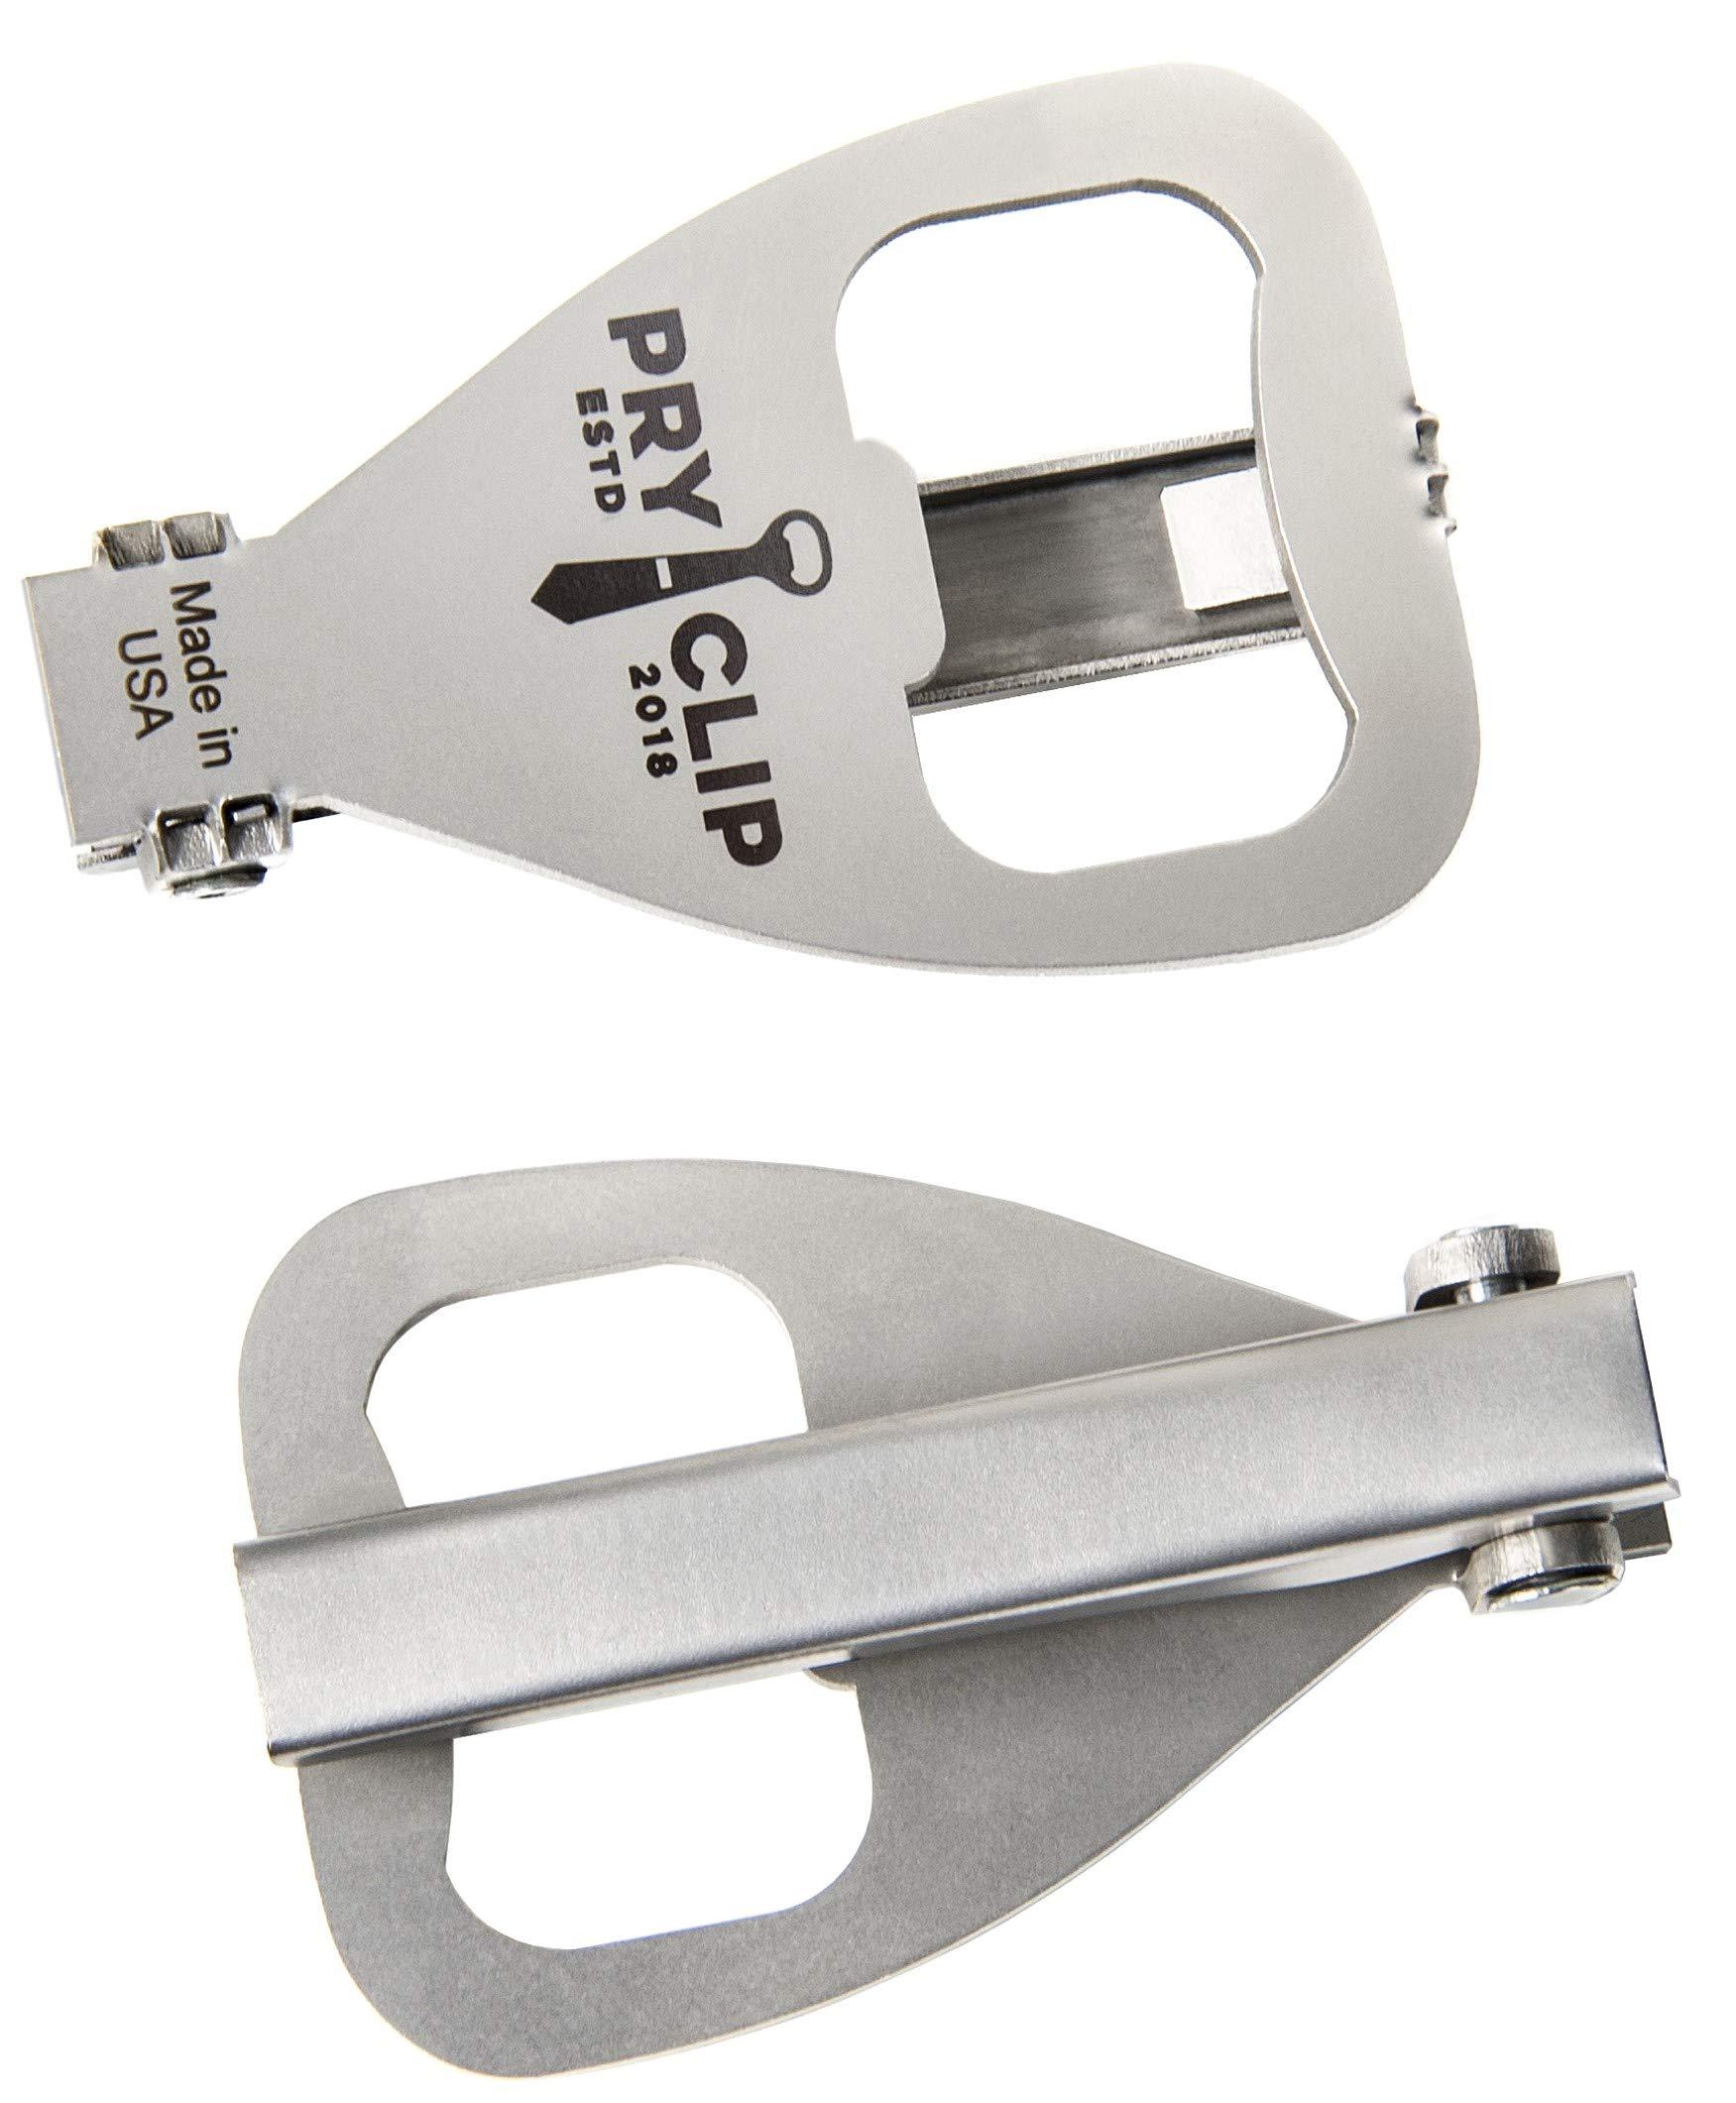 PRYCLIP - Tie Clip Bottle Opener, Laser Engraved, Gift Bag Included by PRYCLIP (Image #1)